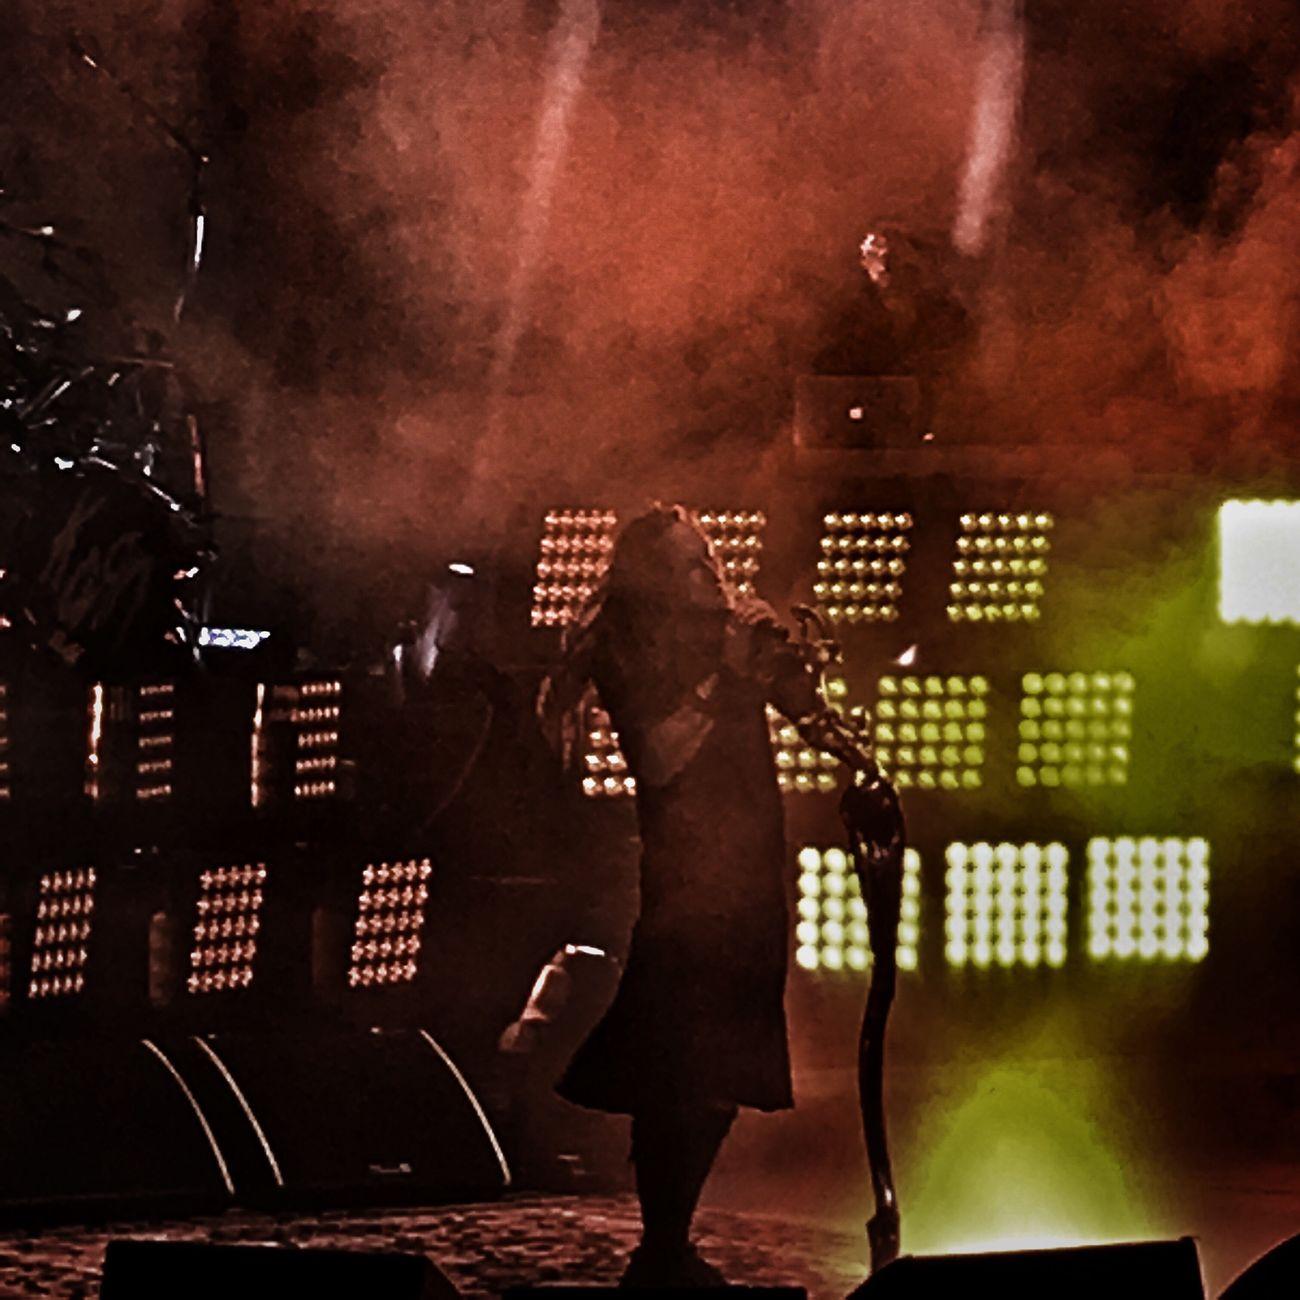 Korn Jonathandavis Jdevil The Bitch  Stage Performance Music Stage - Performance Space Stagephotography Stage Lights Stage Light Stage Photography Performing Concert Oak Mountain Amphitheater Alabama